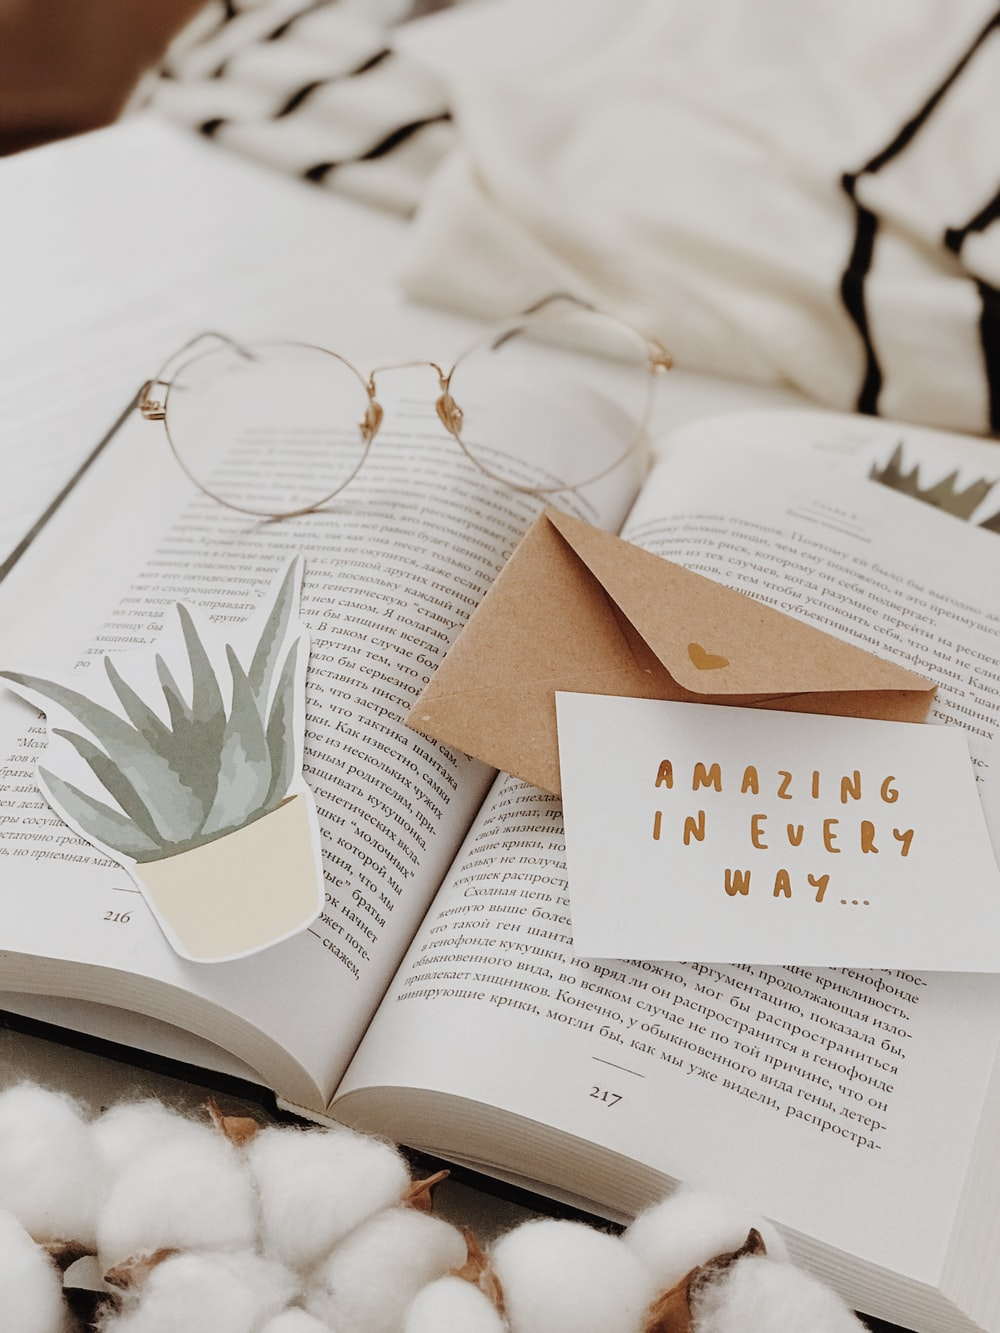 eyeglasses on book near envelope